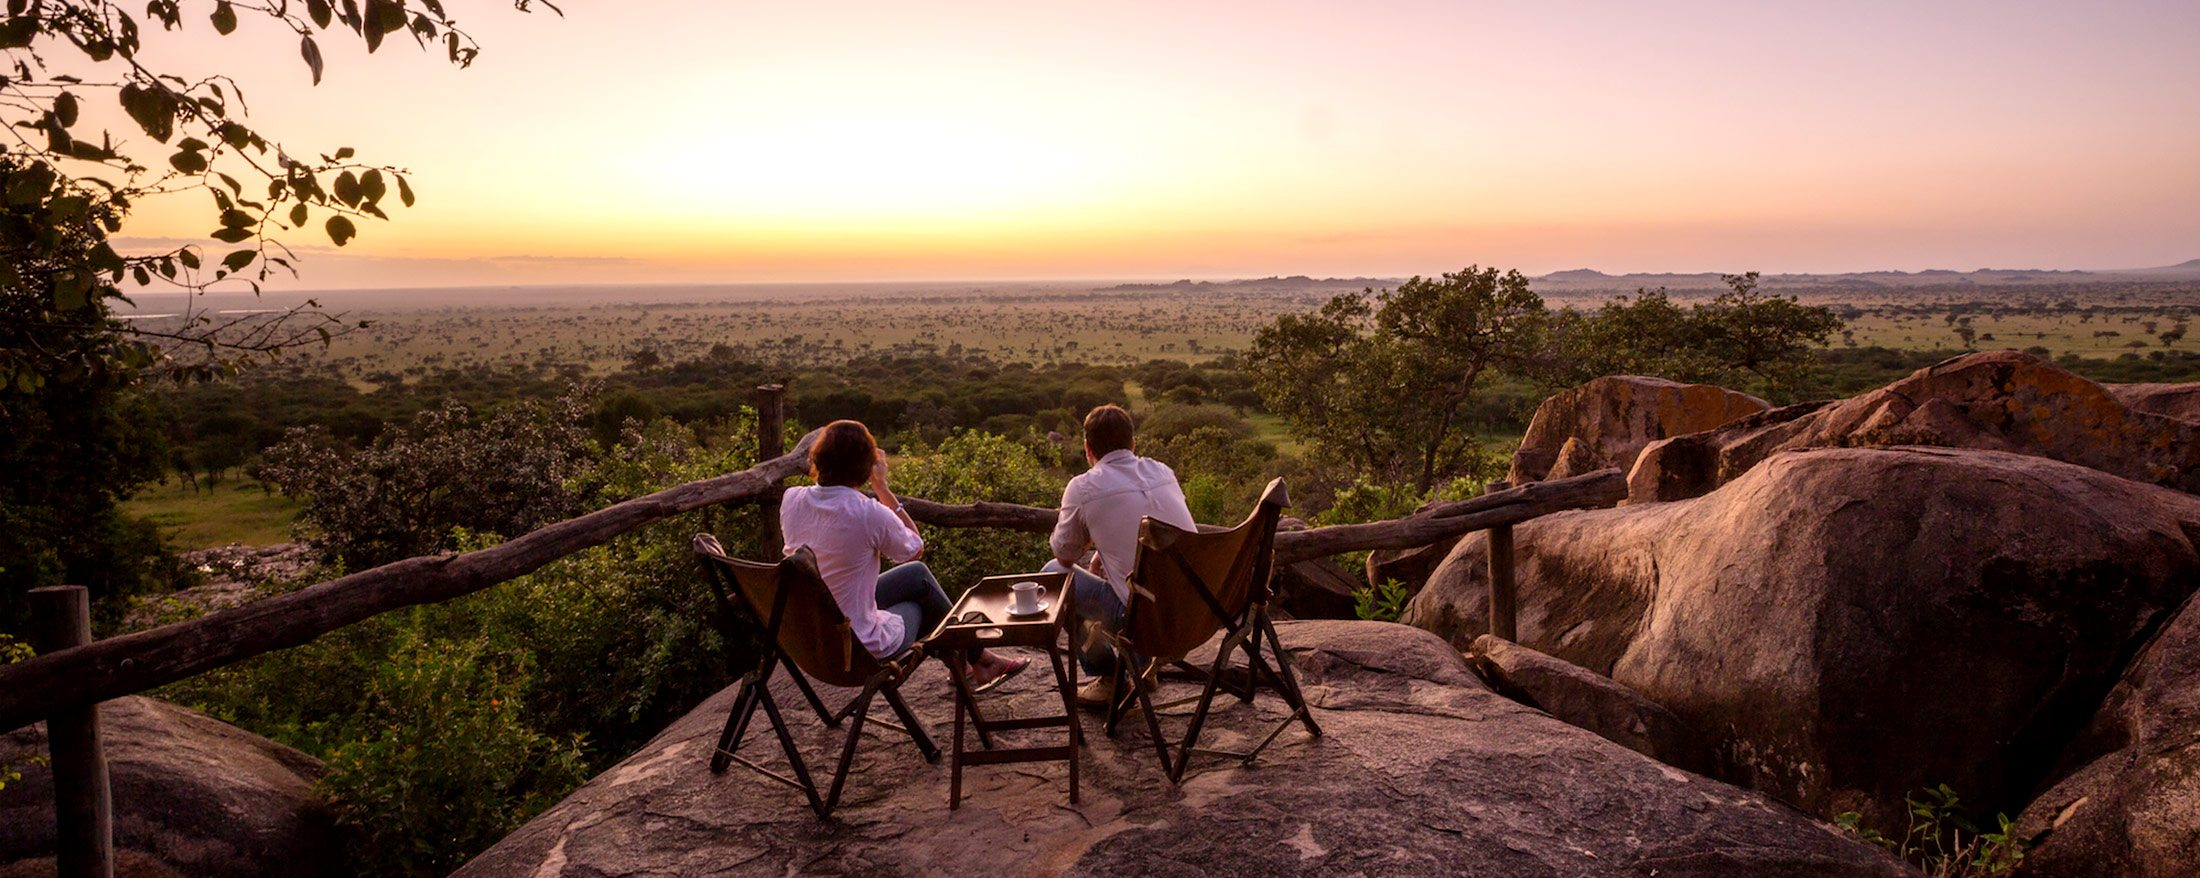 Serengeti Pioneer Camp has lovely views of the southern Serengeti National Park.